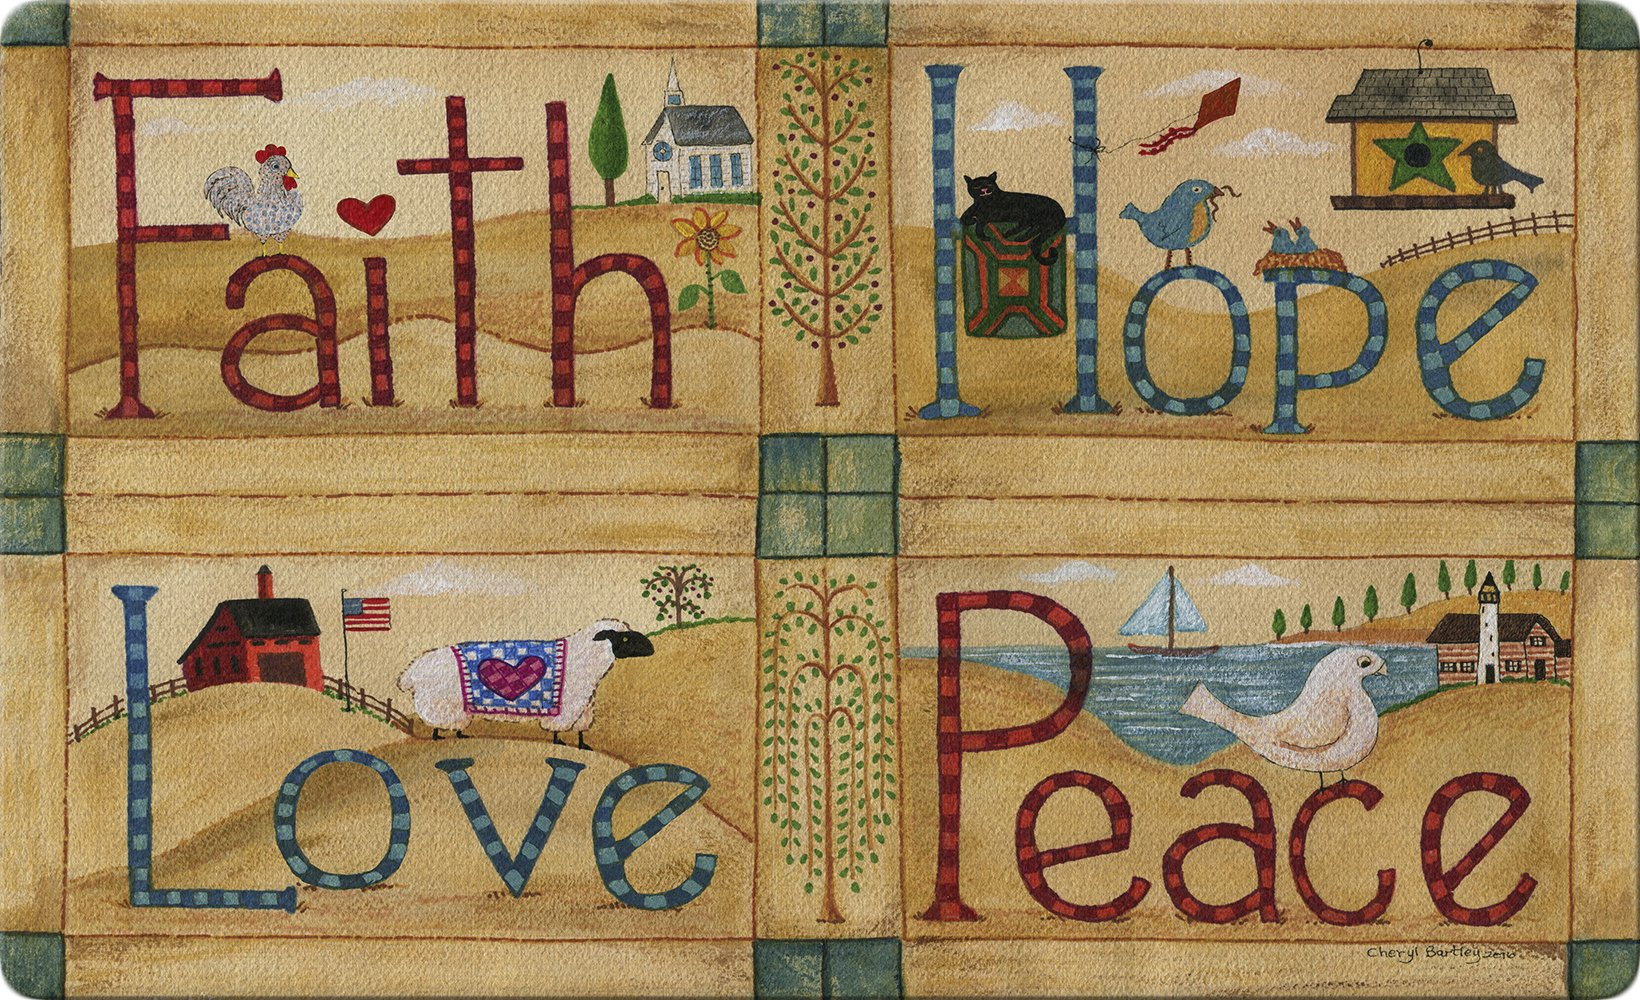 Toland Home Garden Faith Hope Love Peace 18 x 30 Inch Decorative Americana Floor Mat Rustic Farm Doormat